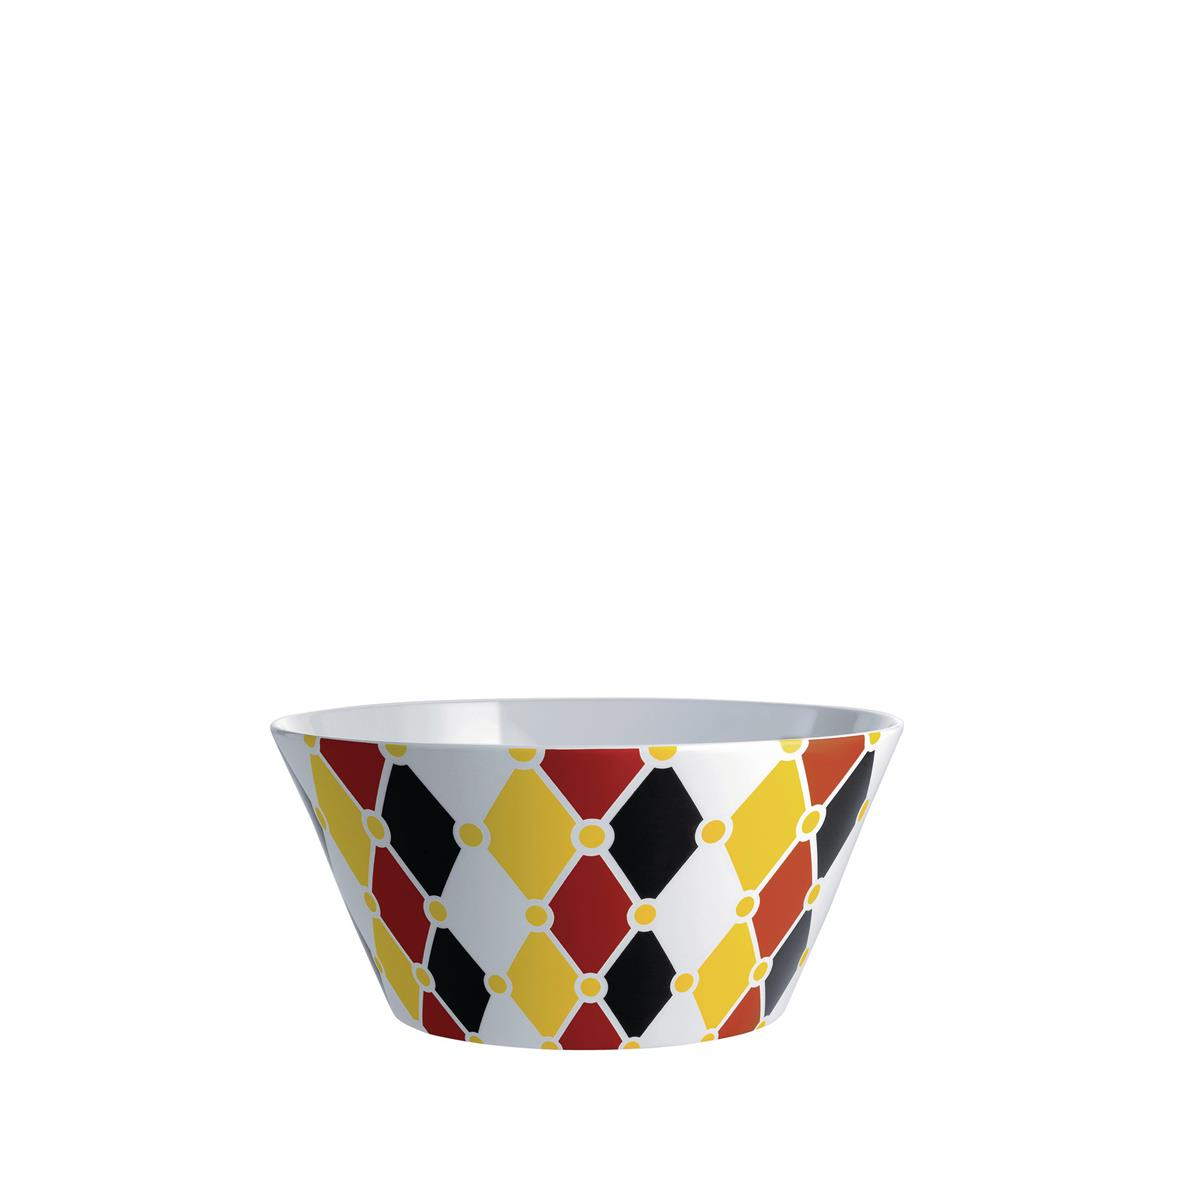 Alessi-Circus Insalatiera in bone china decorata